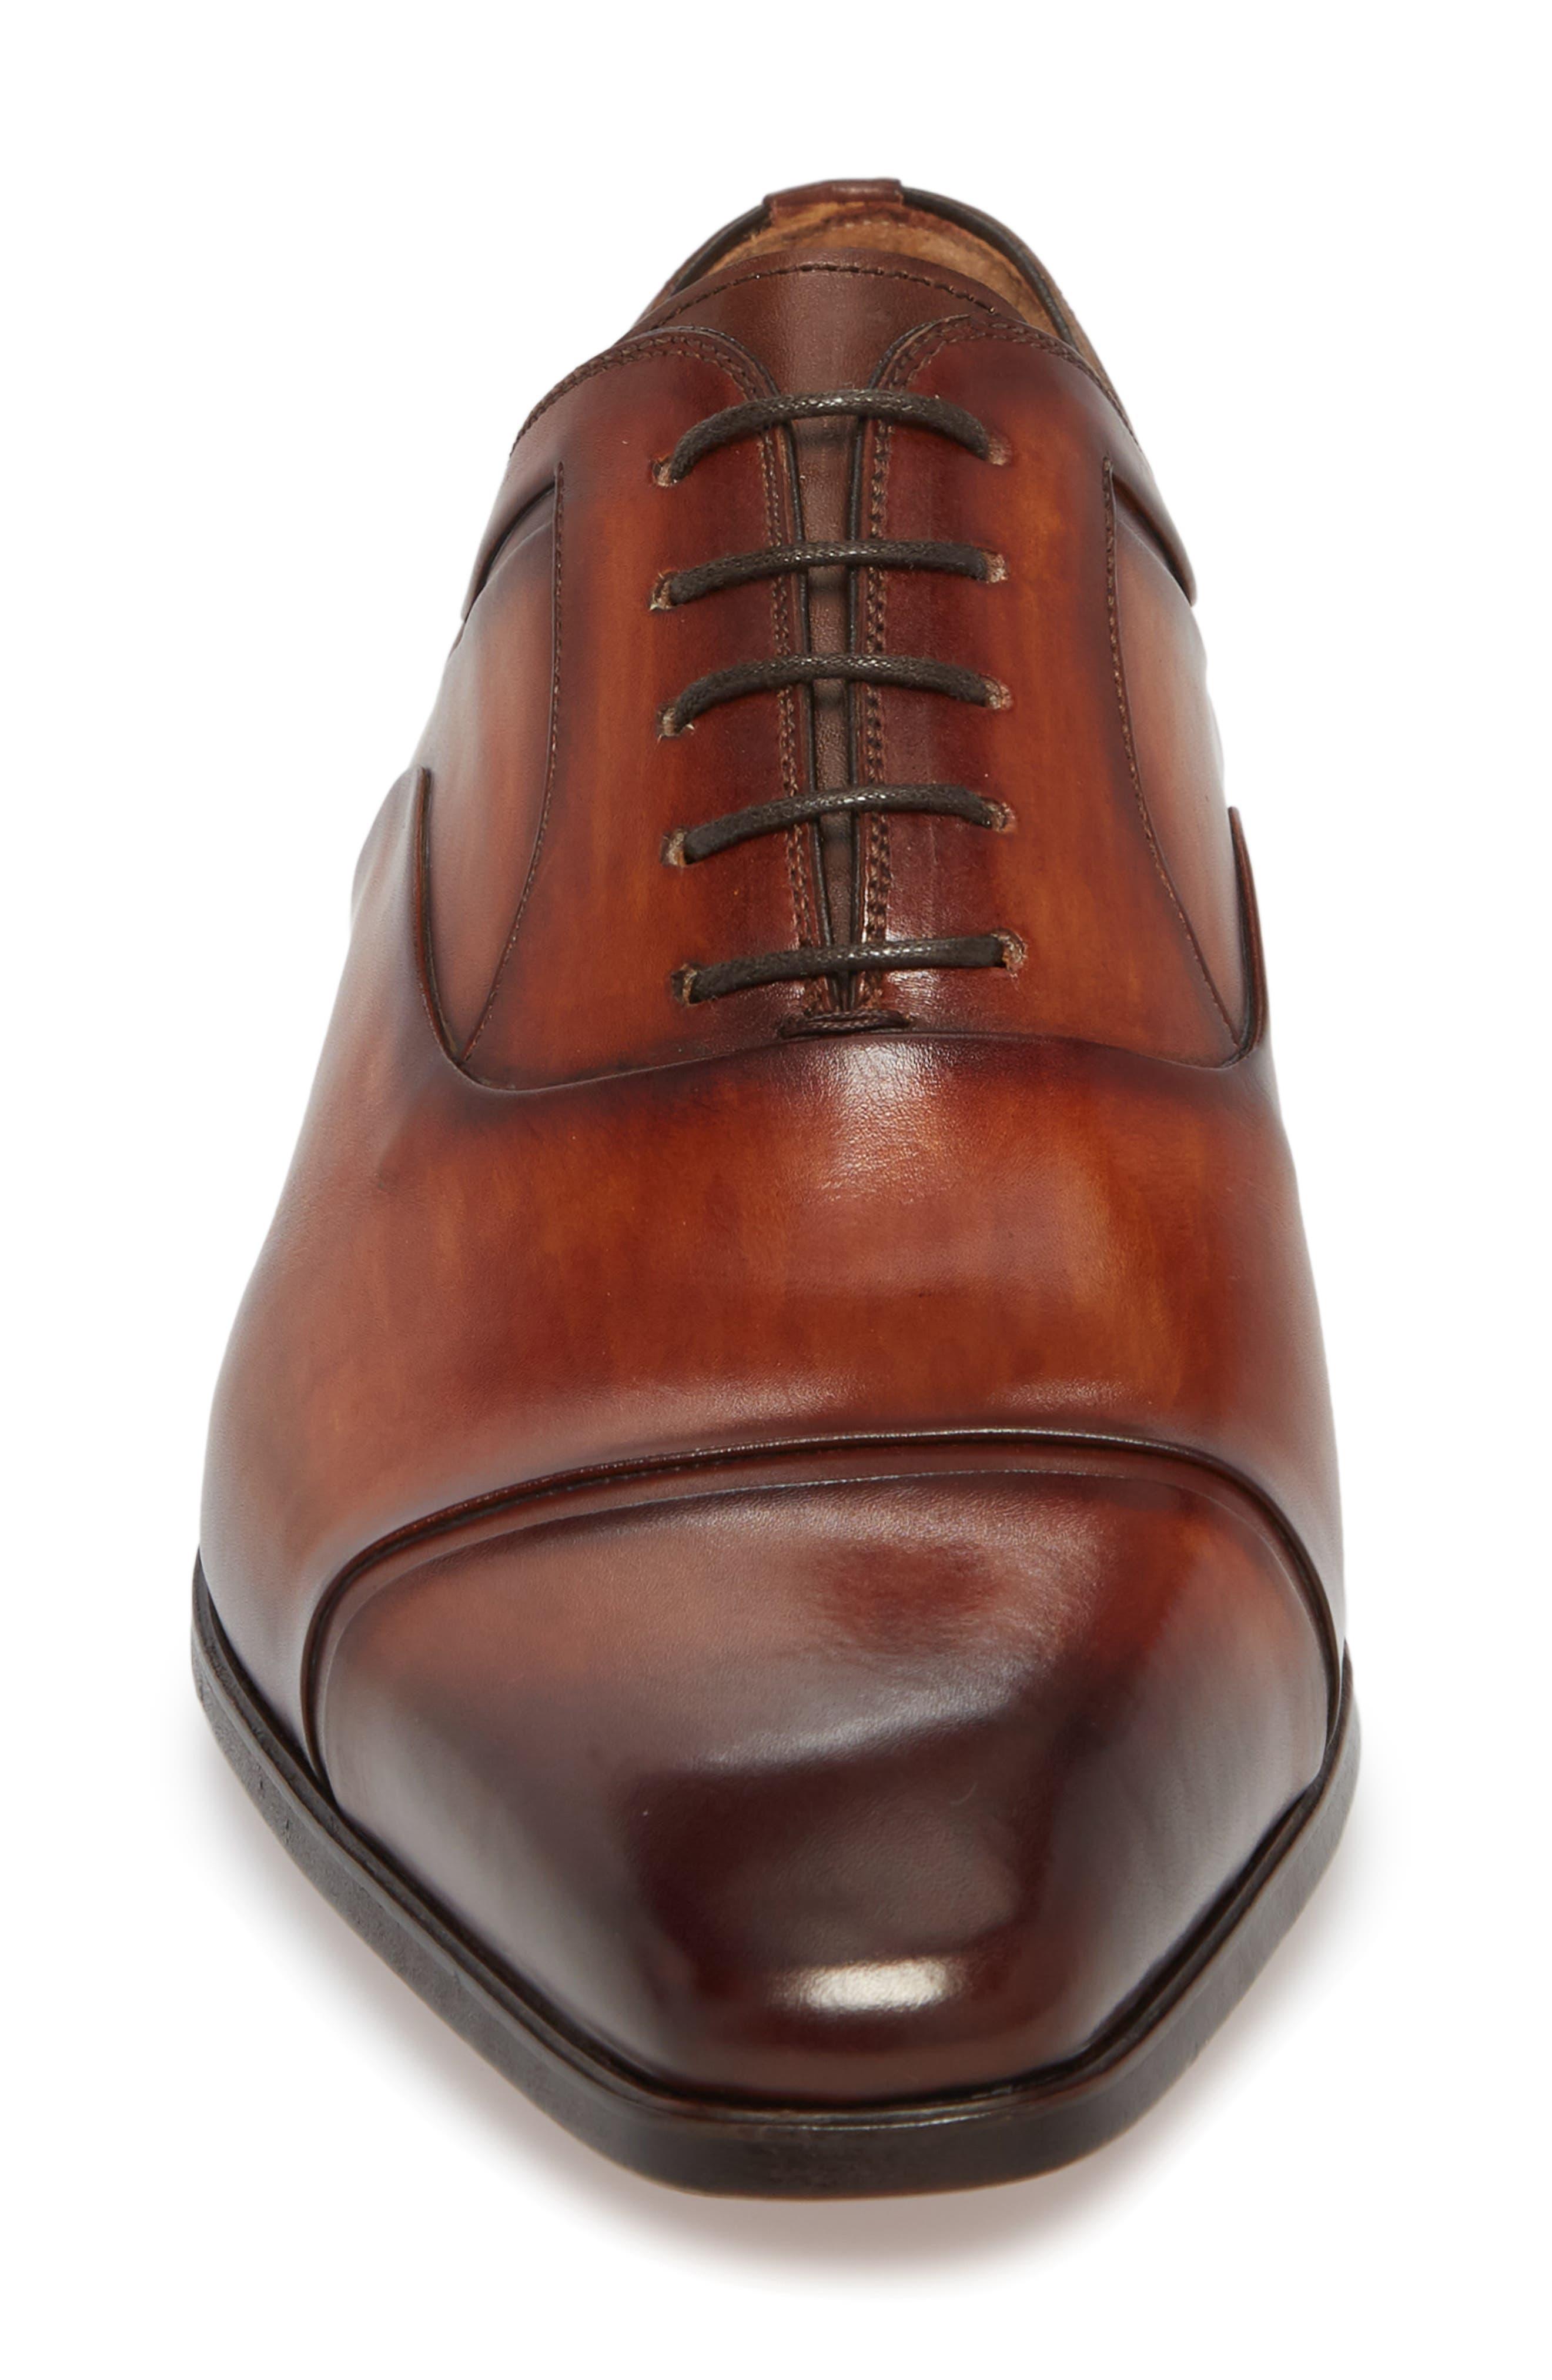 Tobin Cap Toe Oxford,                             Alternate thumbnail 4, color,                             Cognac Leather